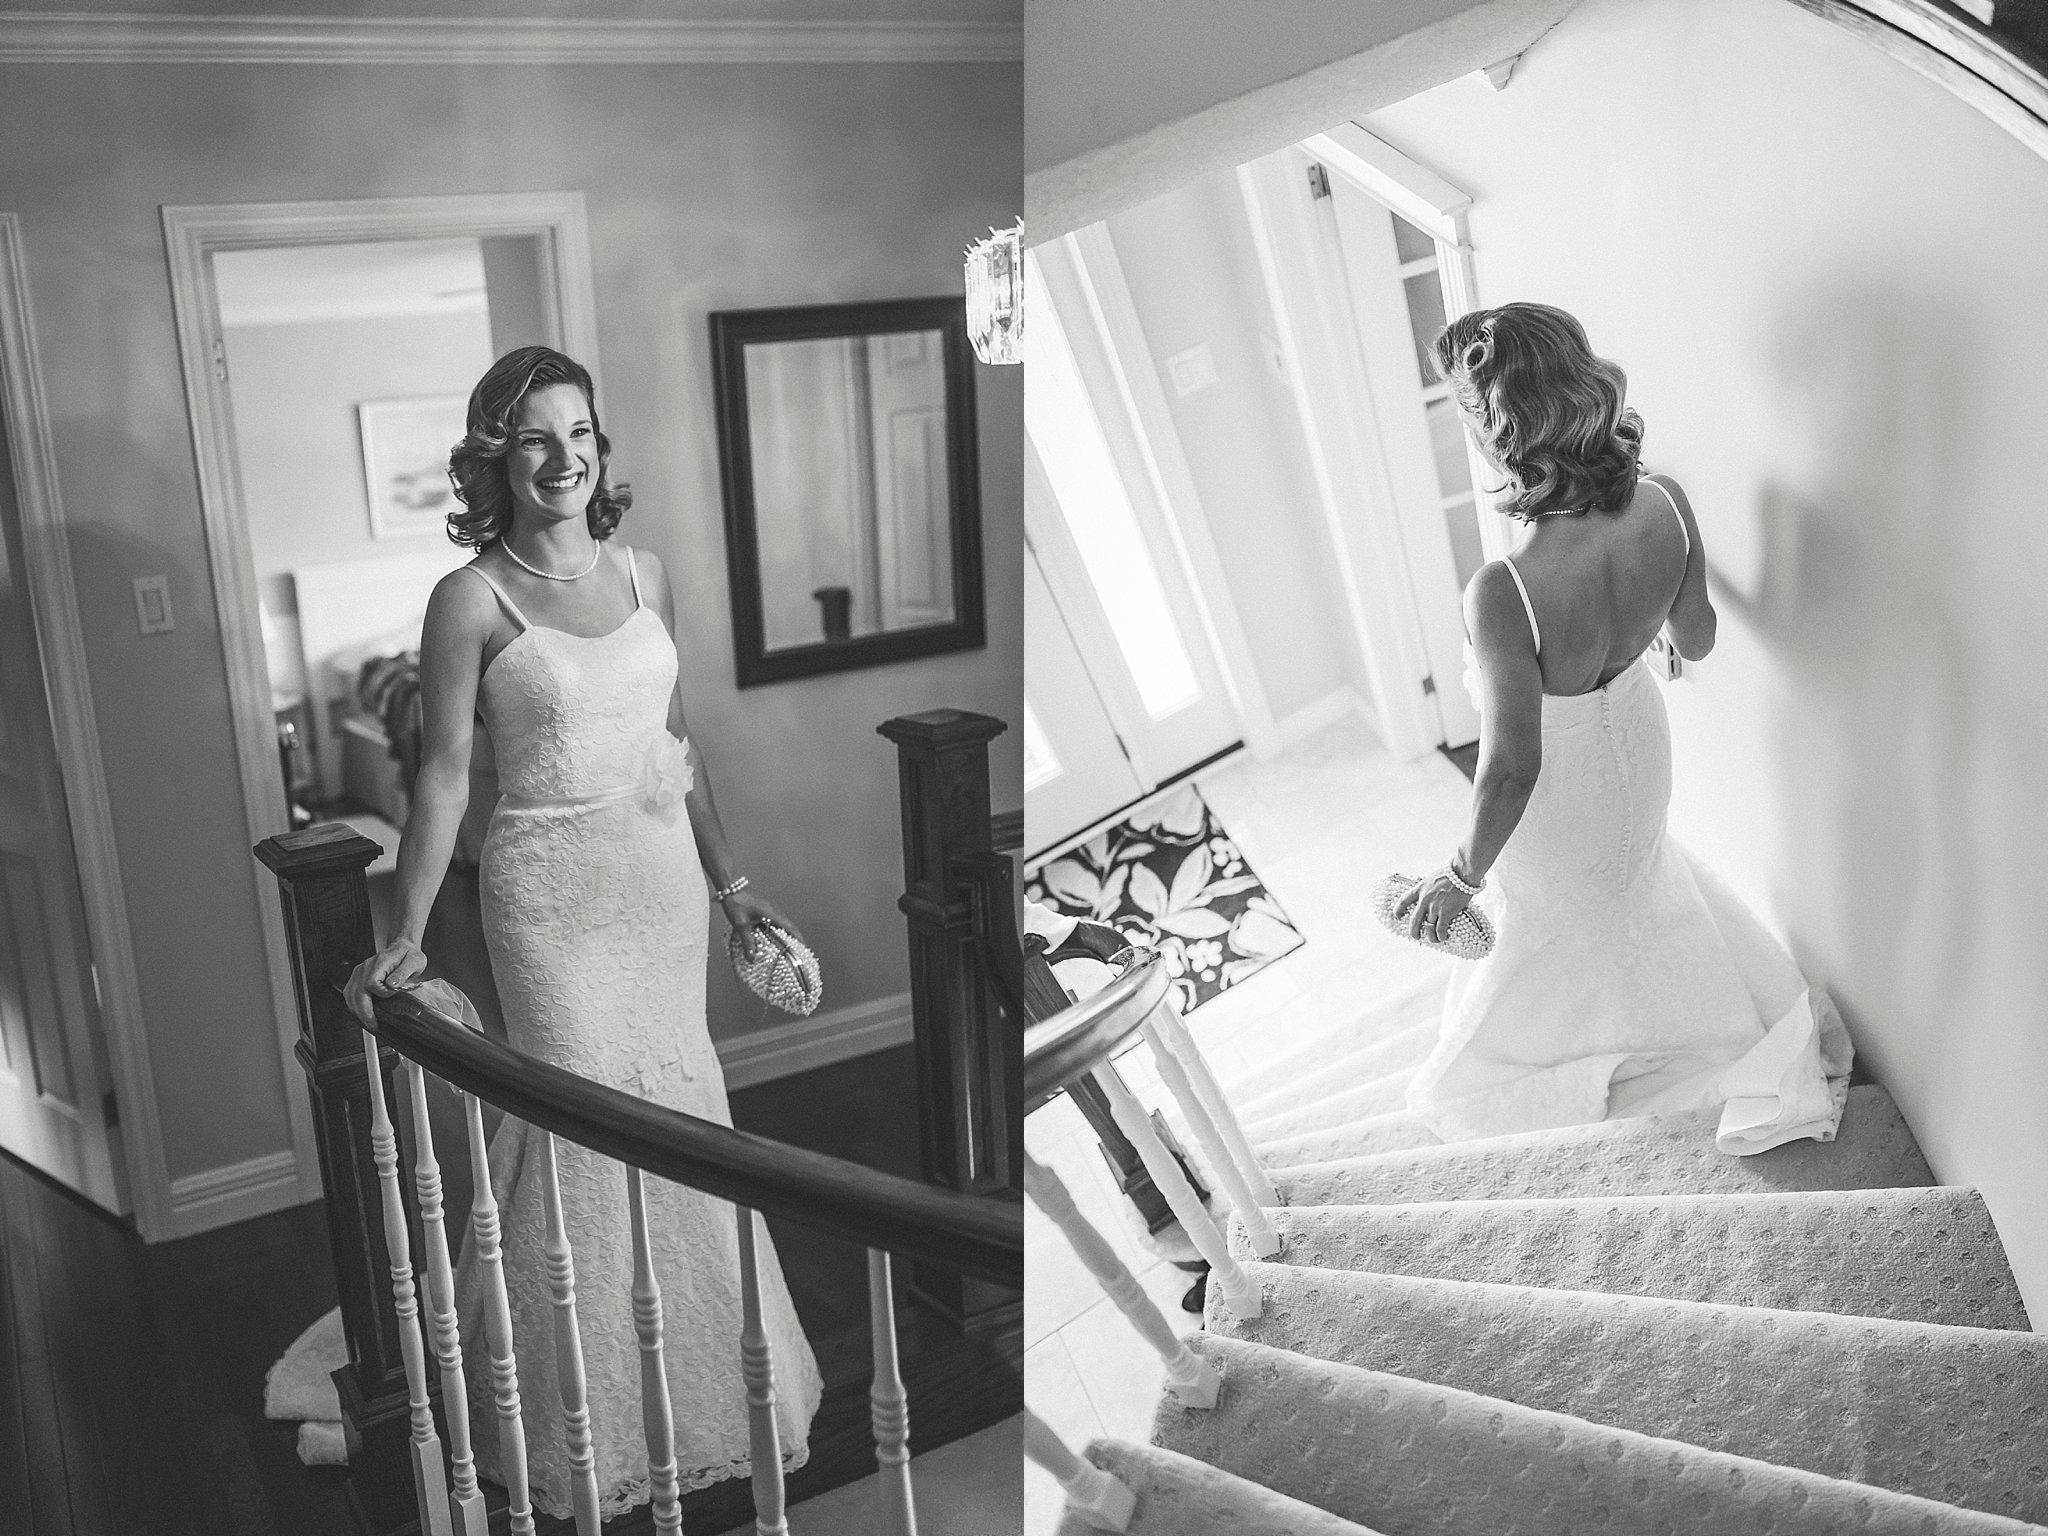 Bride prepares for her wedding in St. John's, Newfoundland